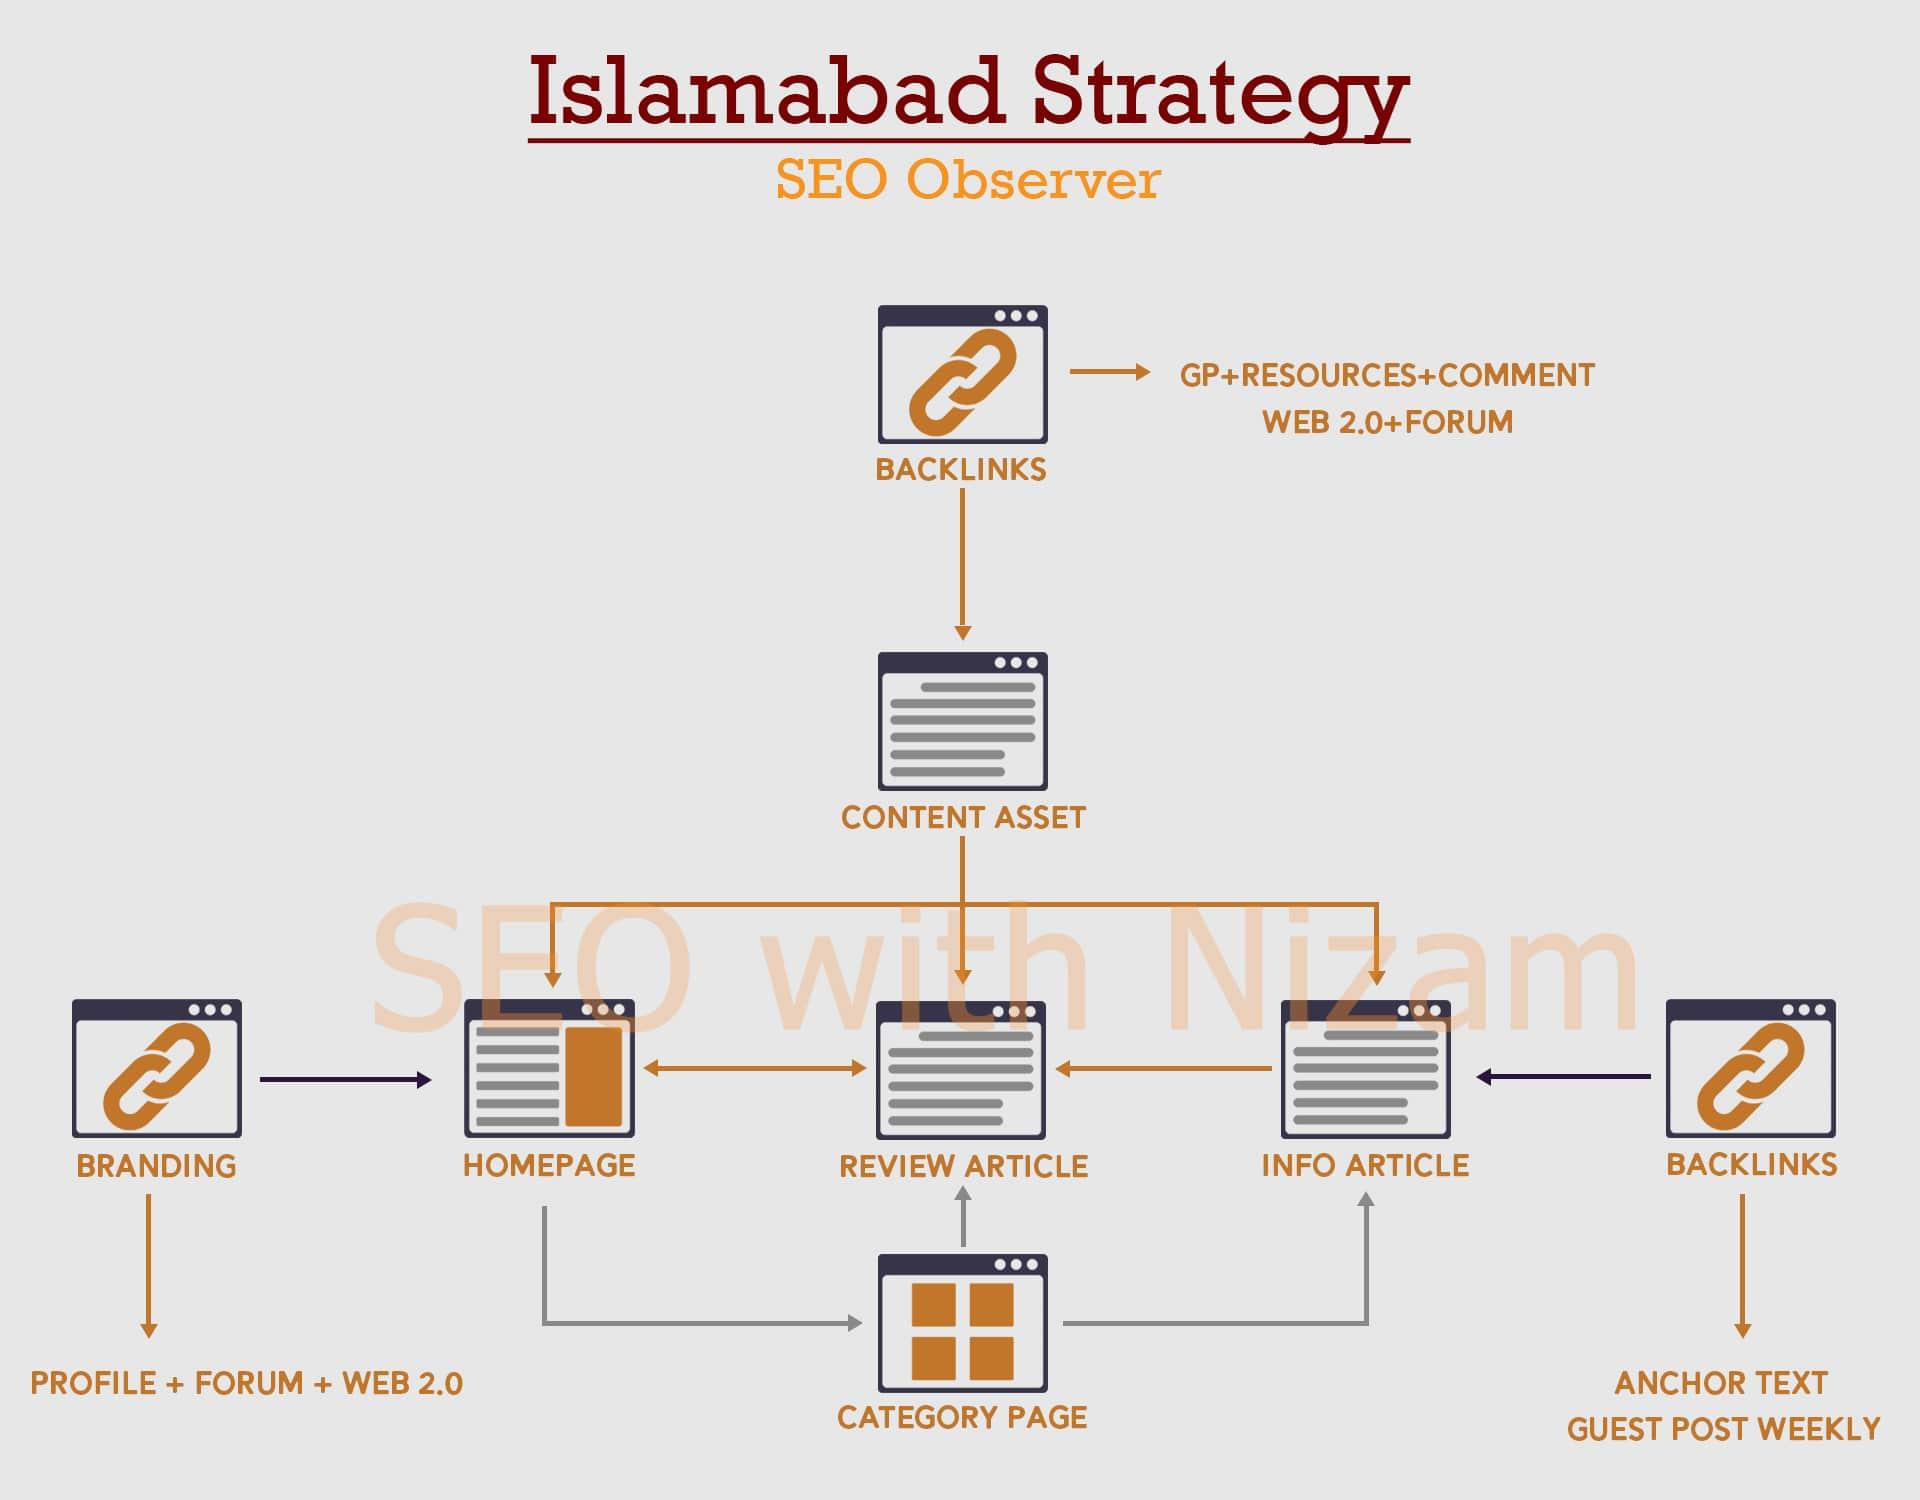 Islamabad SEO Strategy